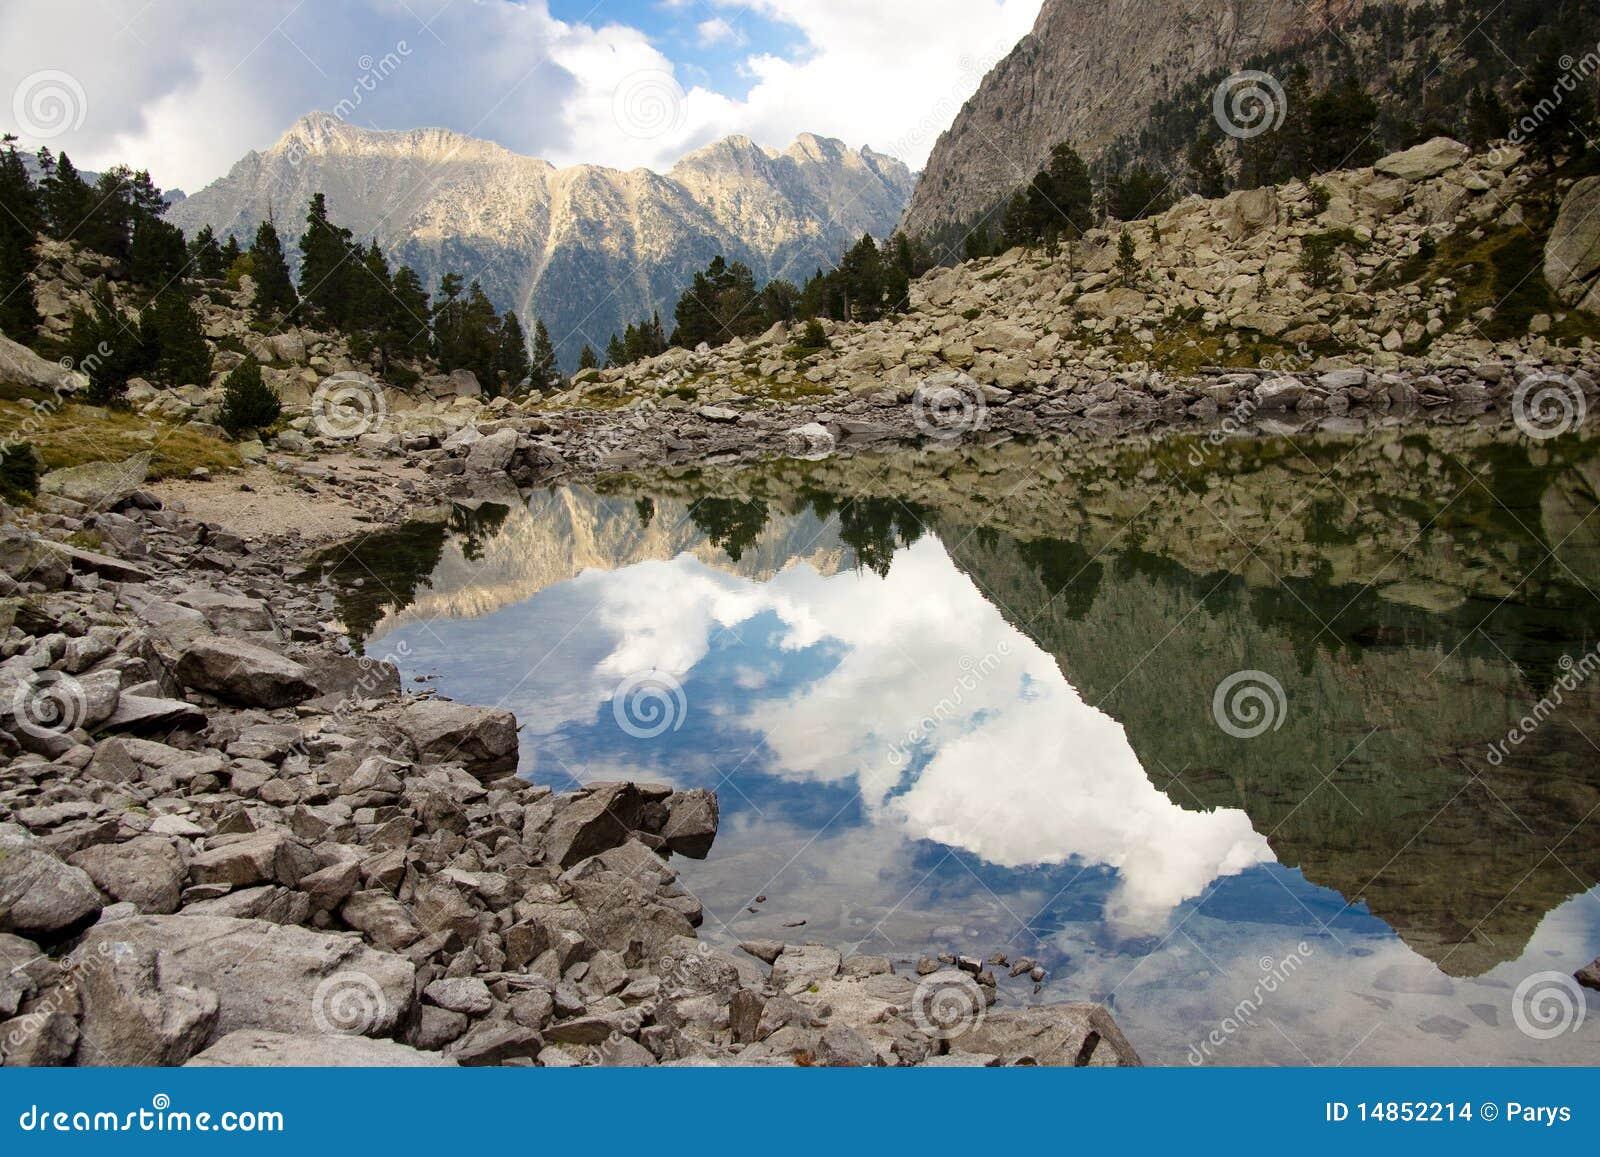 Beauty reflection - Aiguestortes National Park